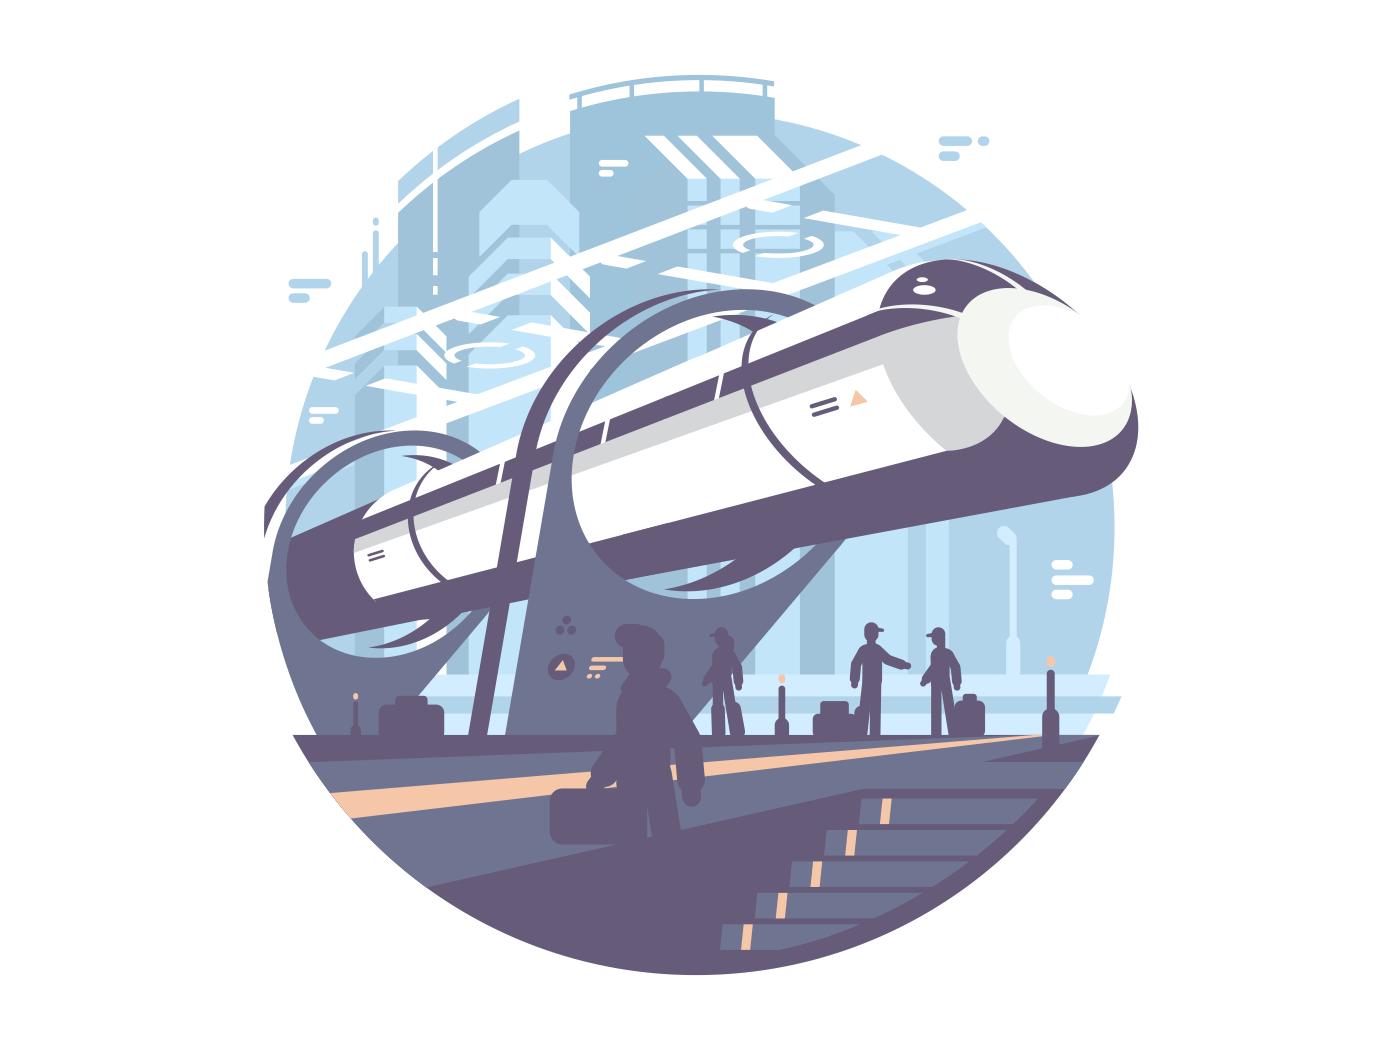 Hyperloop newest passenger public express transport train. Vector icon illustration